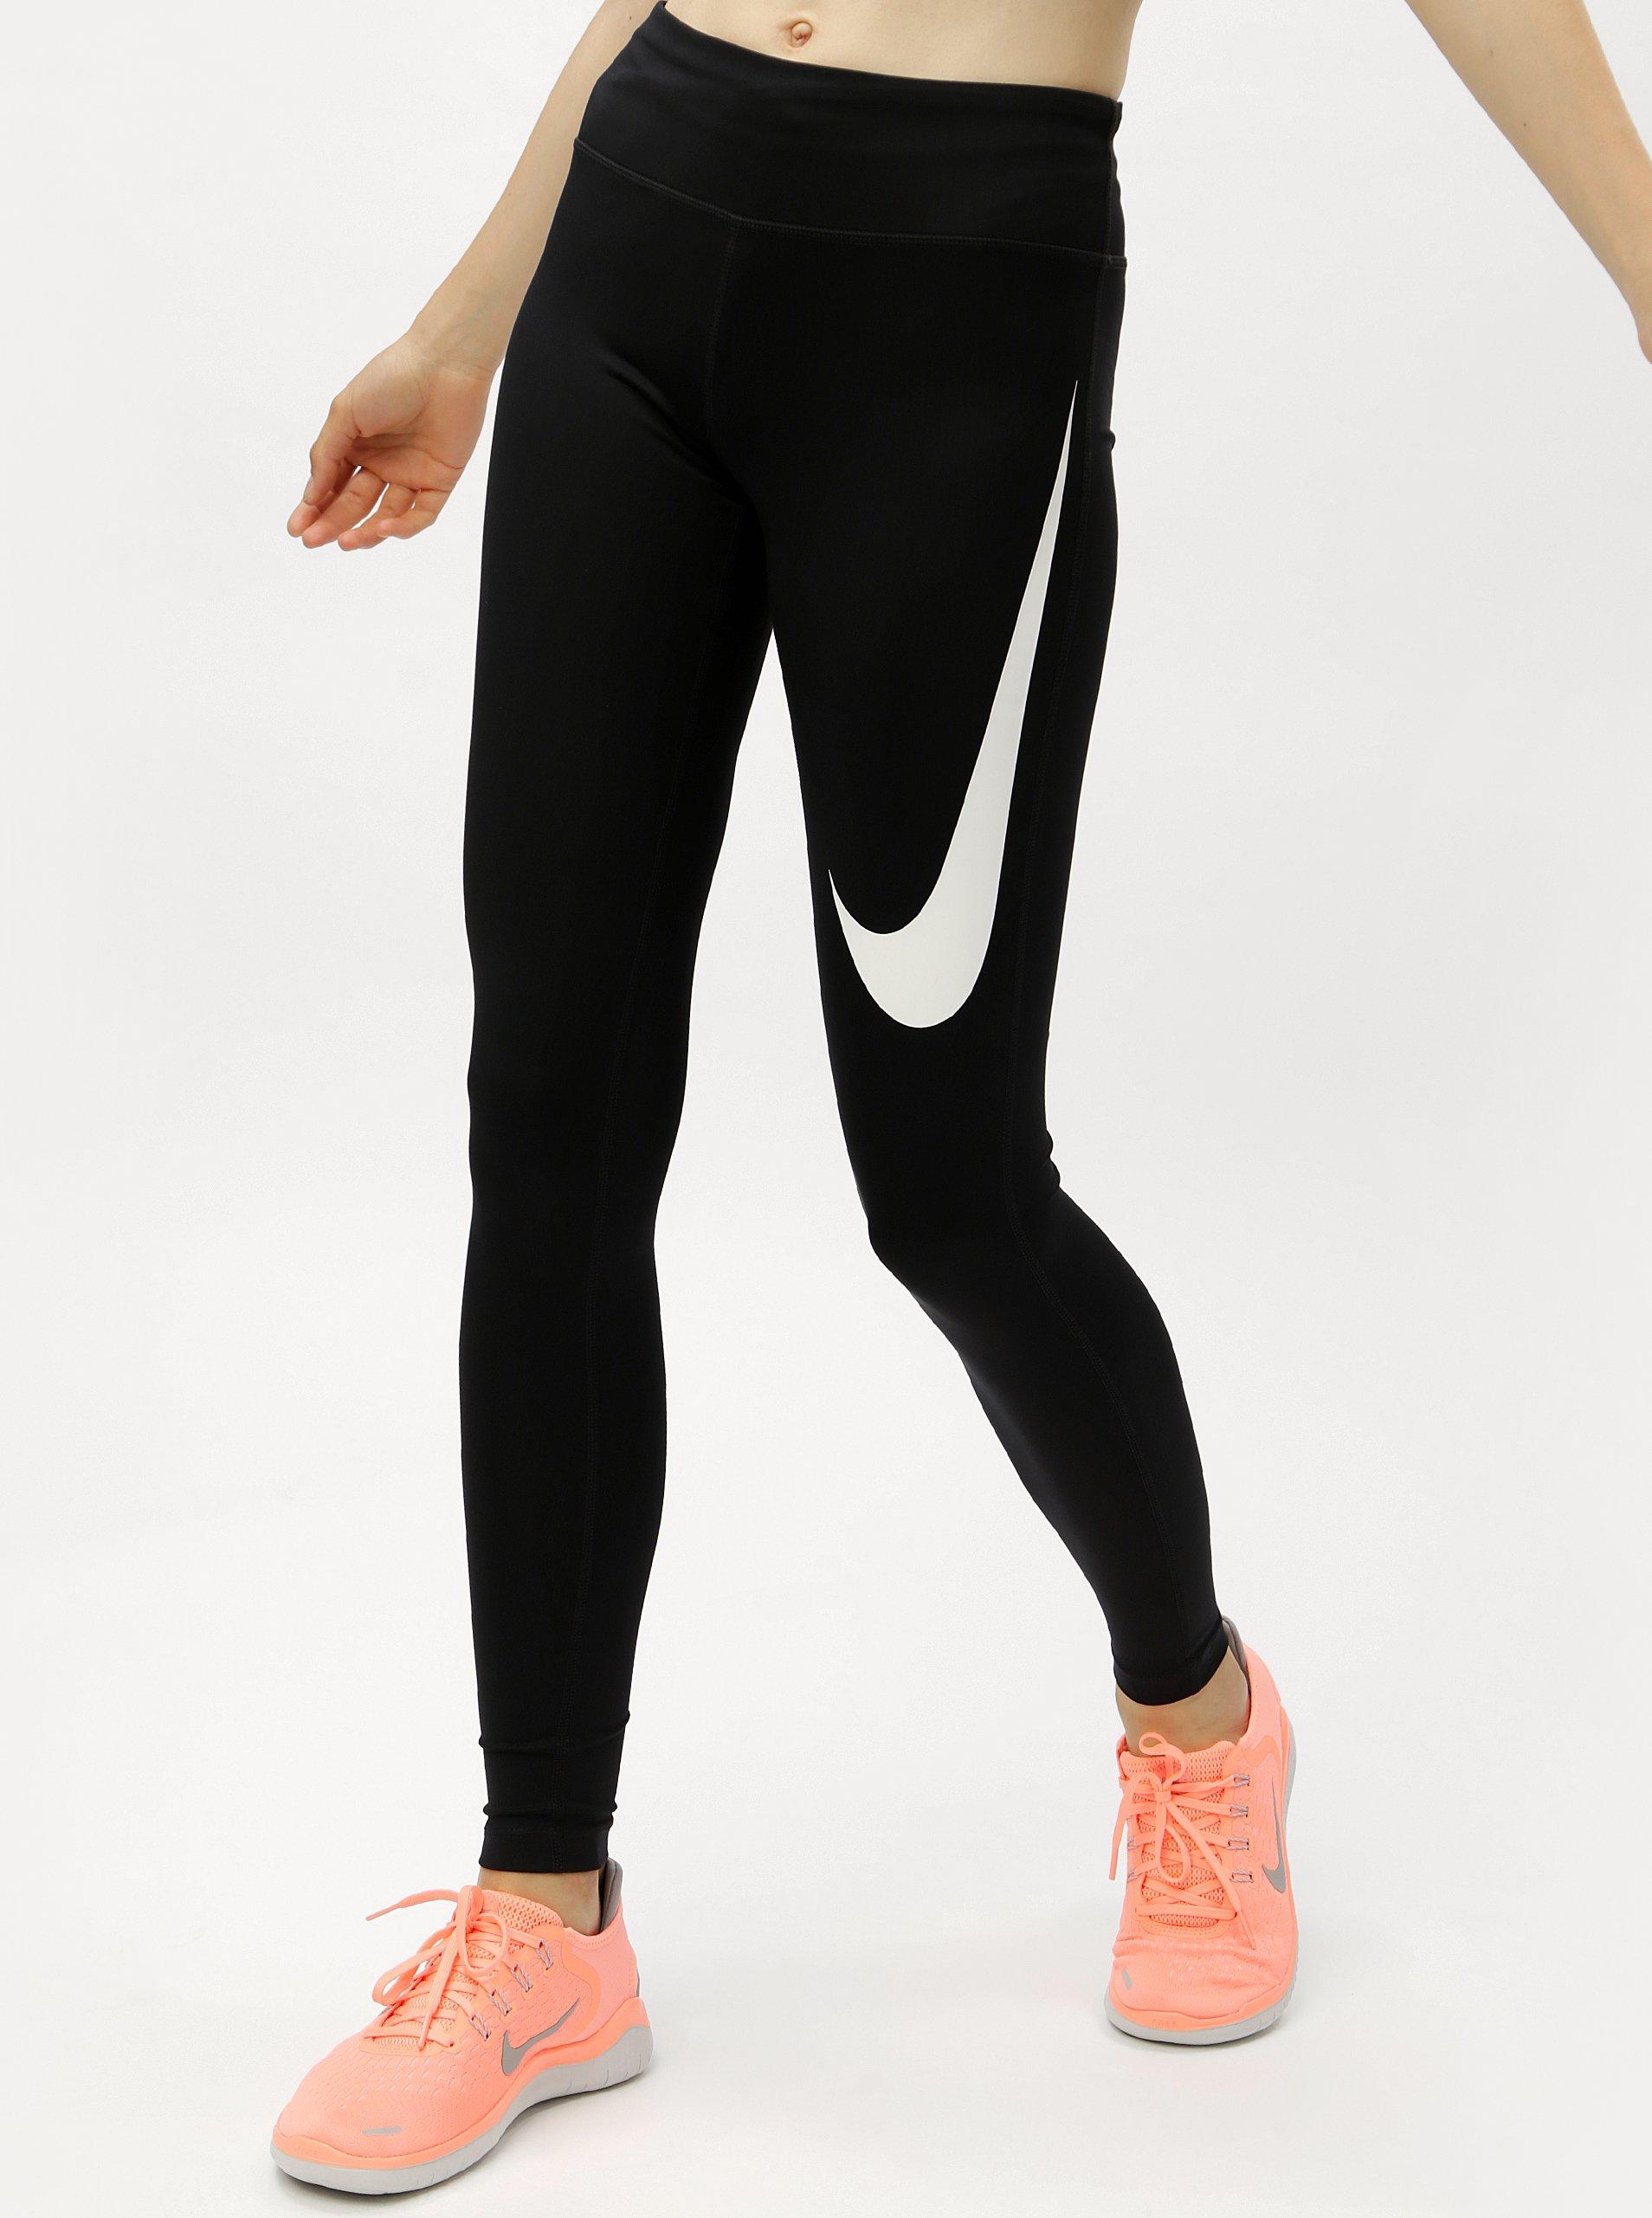 cd558972d969 Čierne dámske funkčné legíny s vreckami Nike